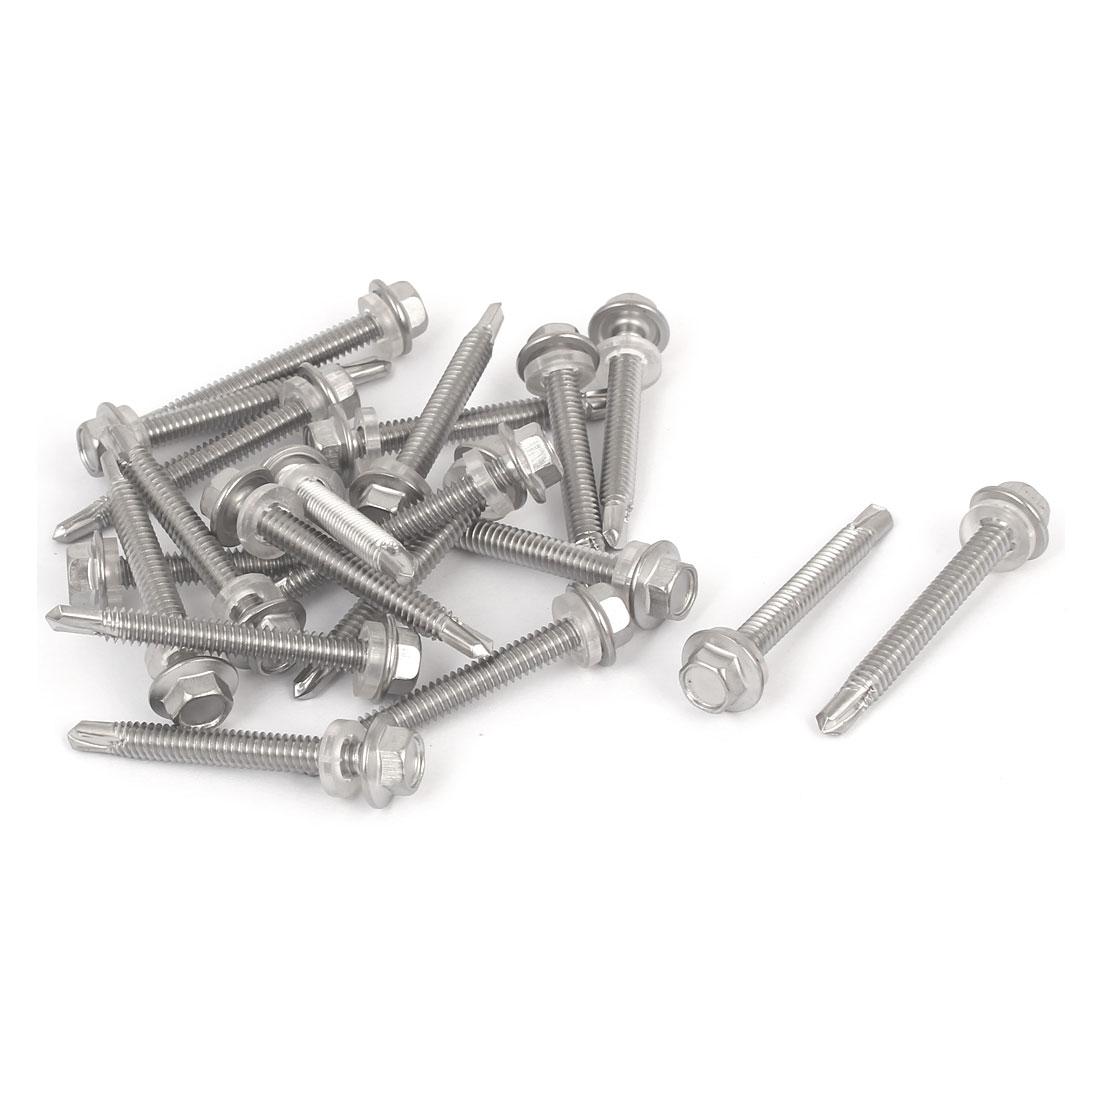 Hex Washer Head Self Tapping Drilling Screw Bolt Silver Tone M5.5x45mm #12-14 Thread 20pcs